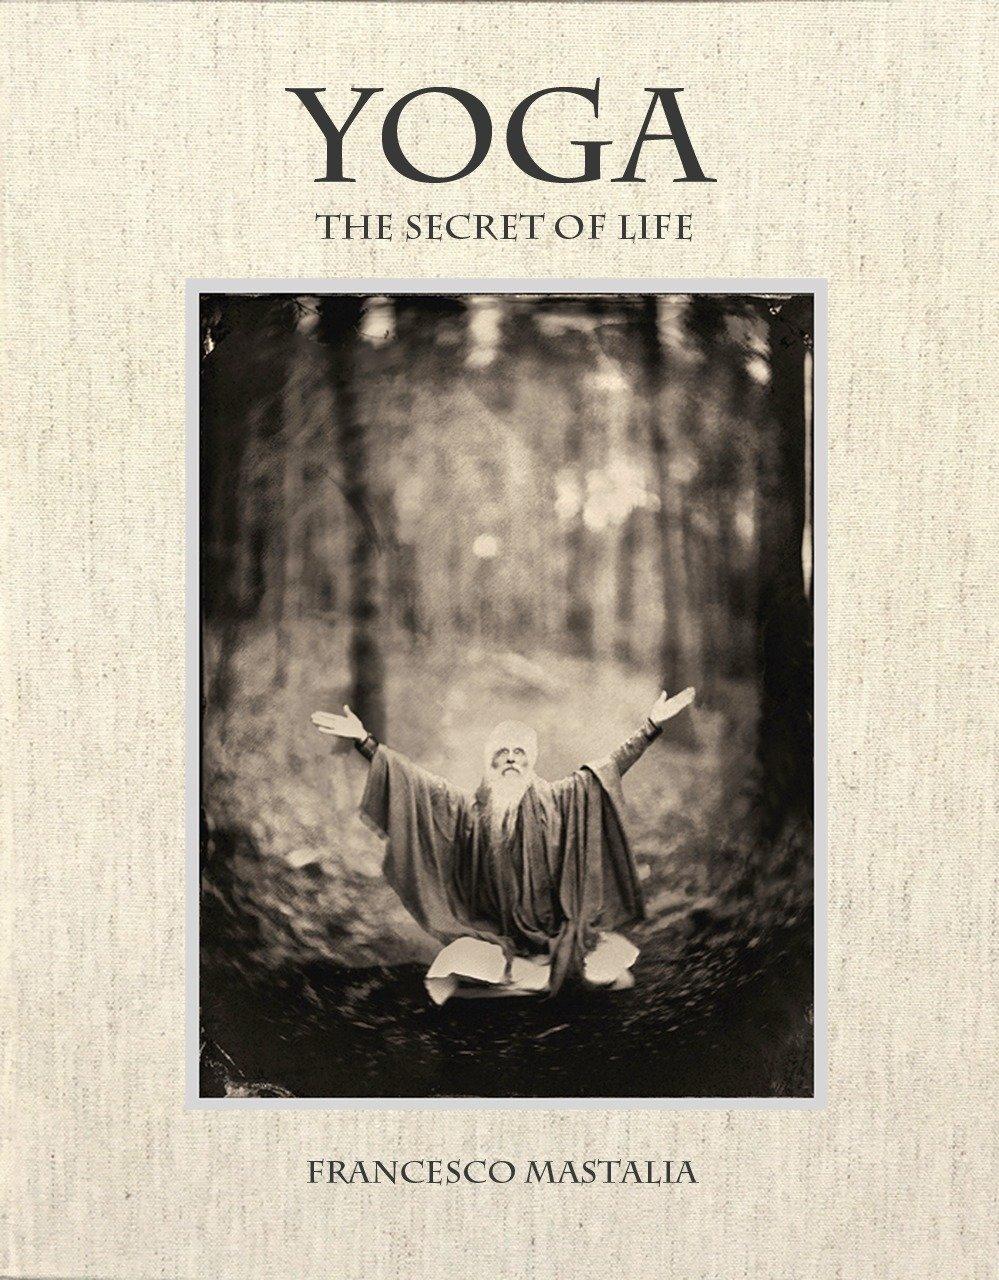 Yoga: The Secret of Life